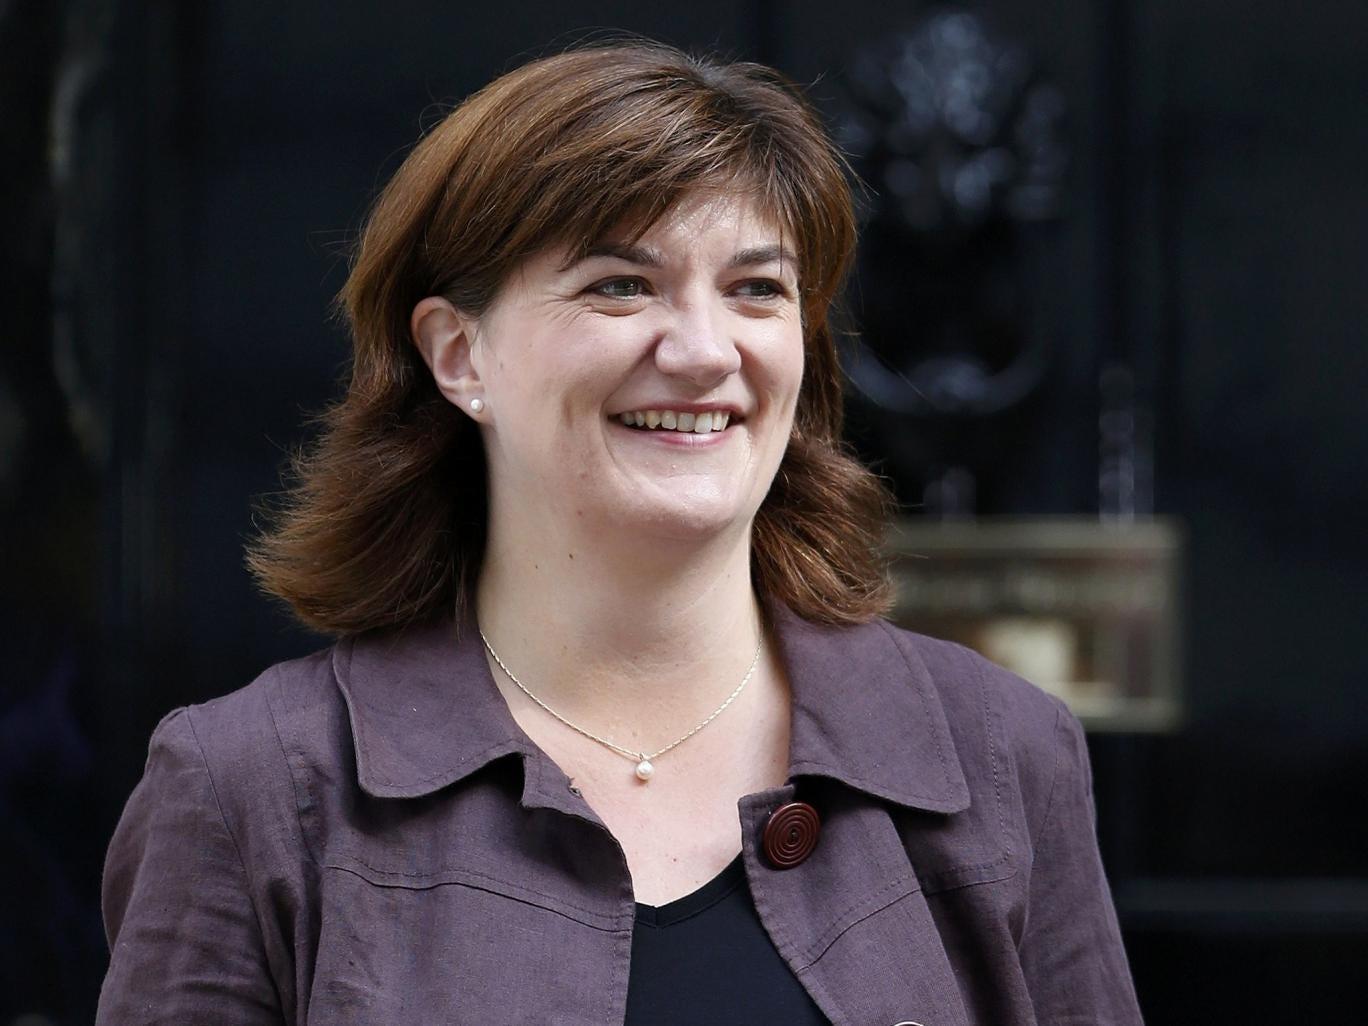 Nicky Morgan becomes new Eduvation Secretary, replacing Michael Gove